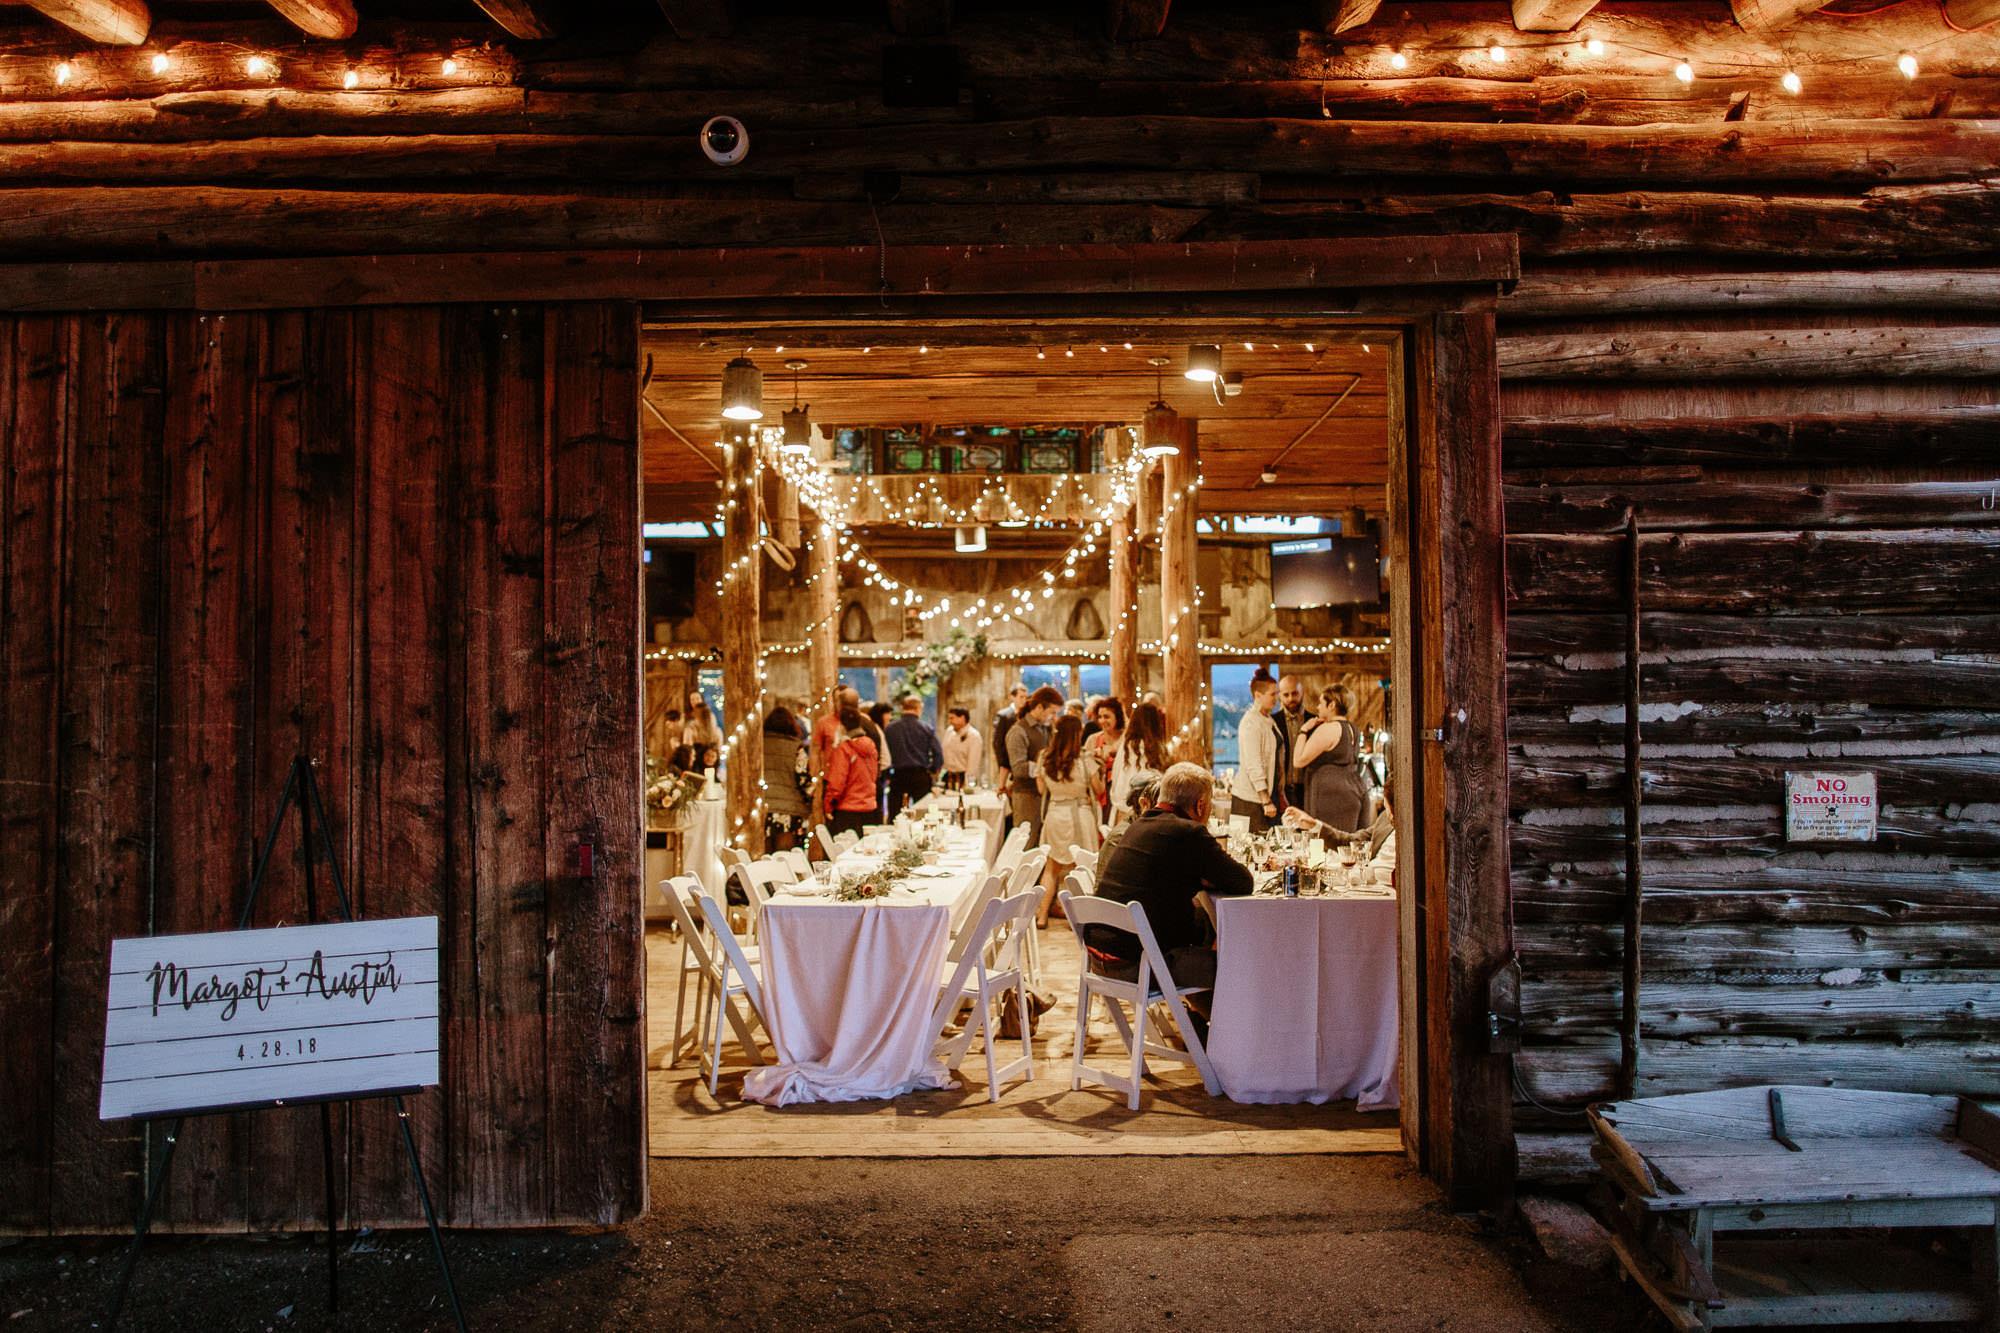 bucci-barn-wedding-elopement-evergreen-boulder-denver-colorado-adventerous-romantic-timeless-103.jpg